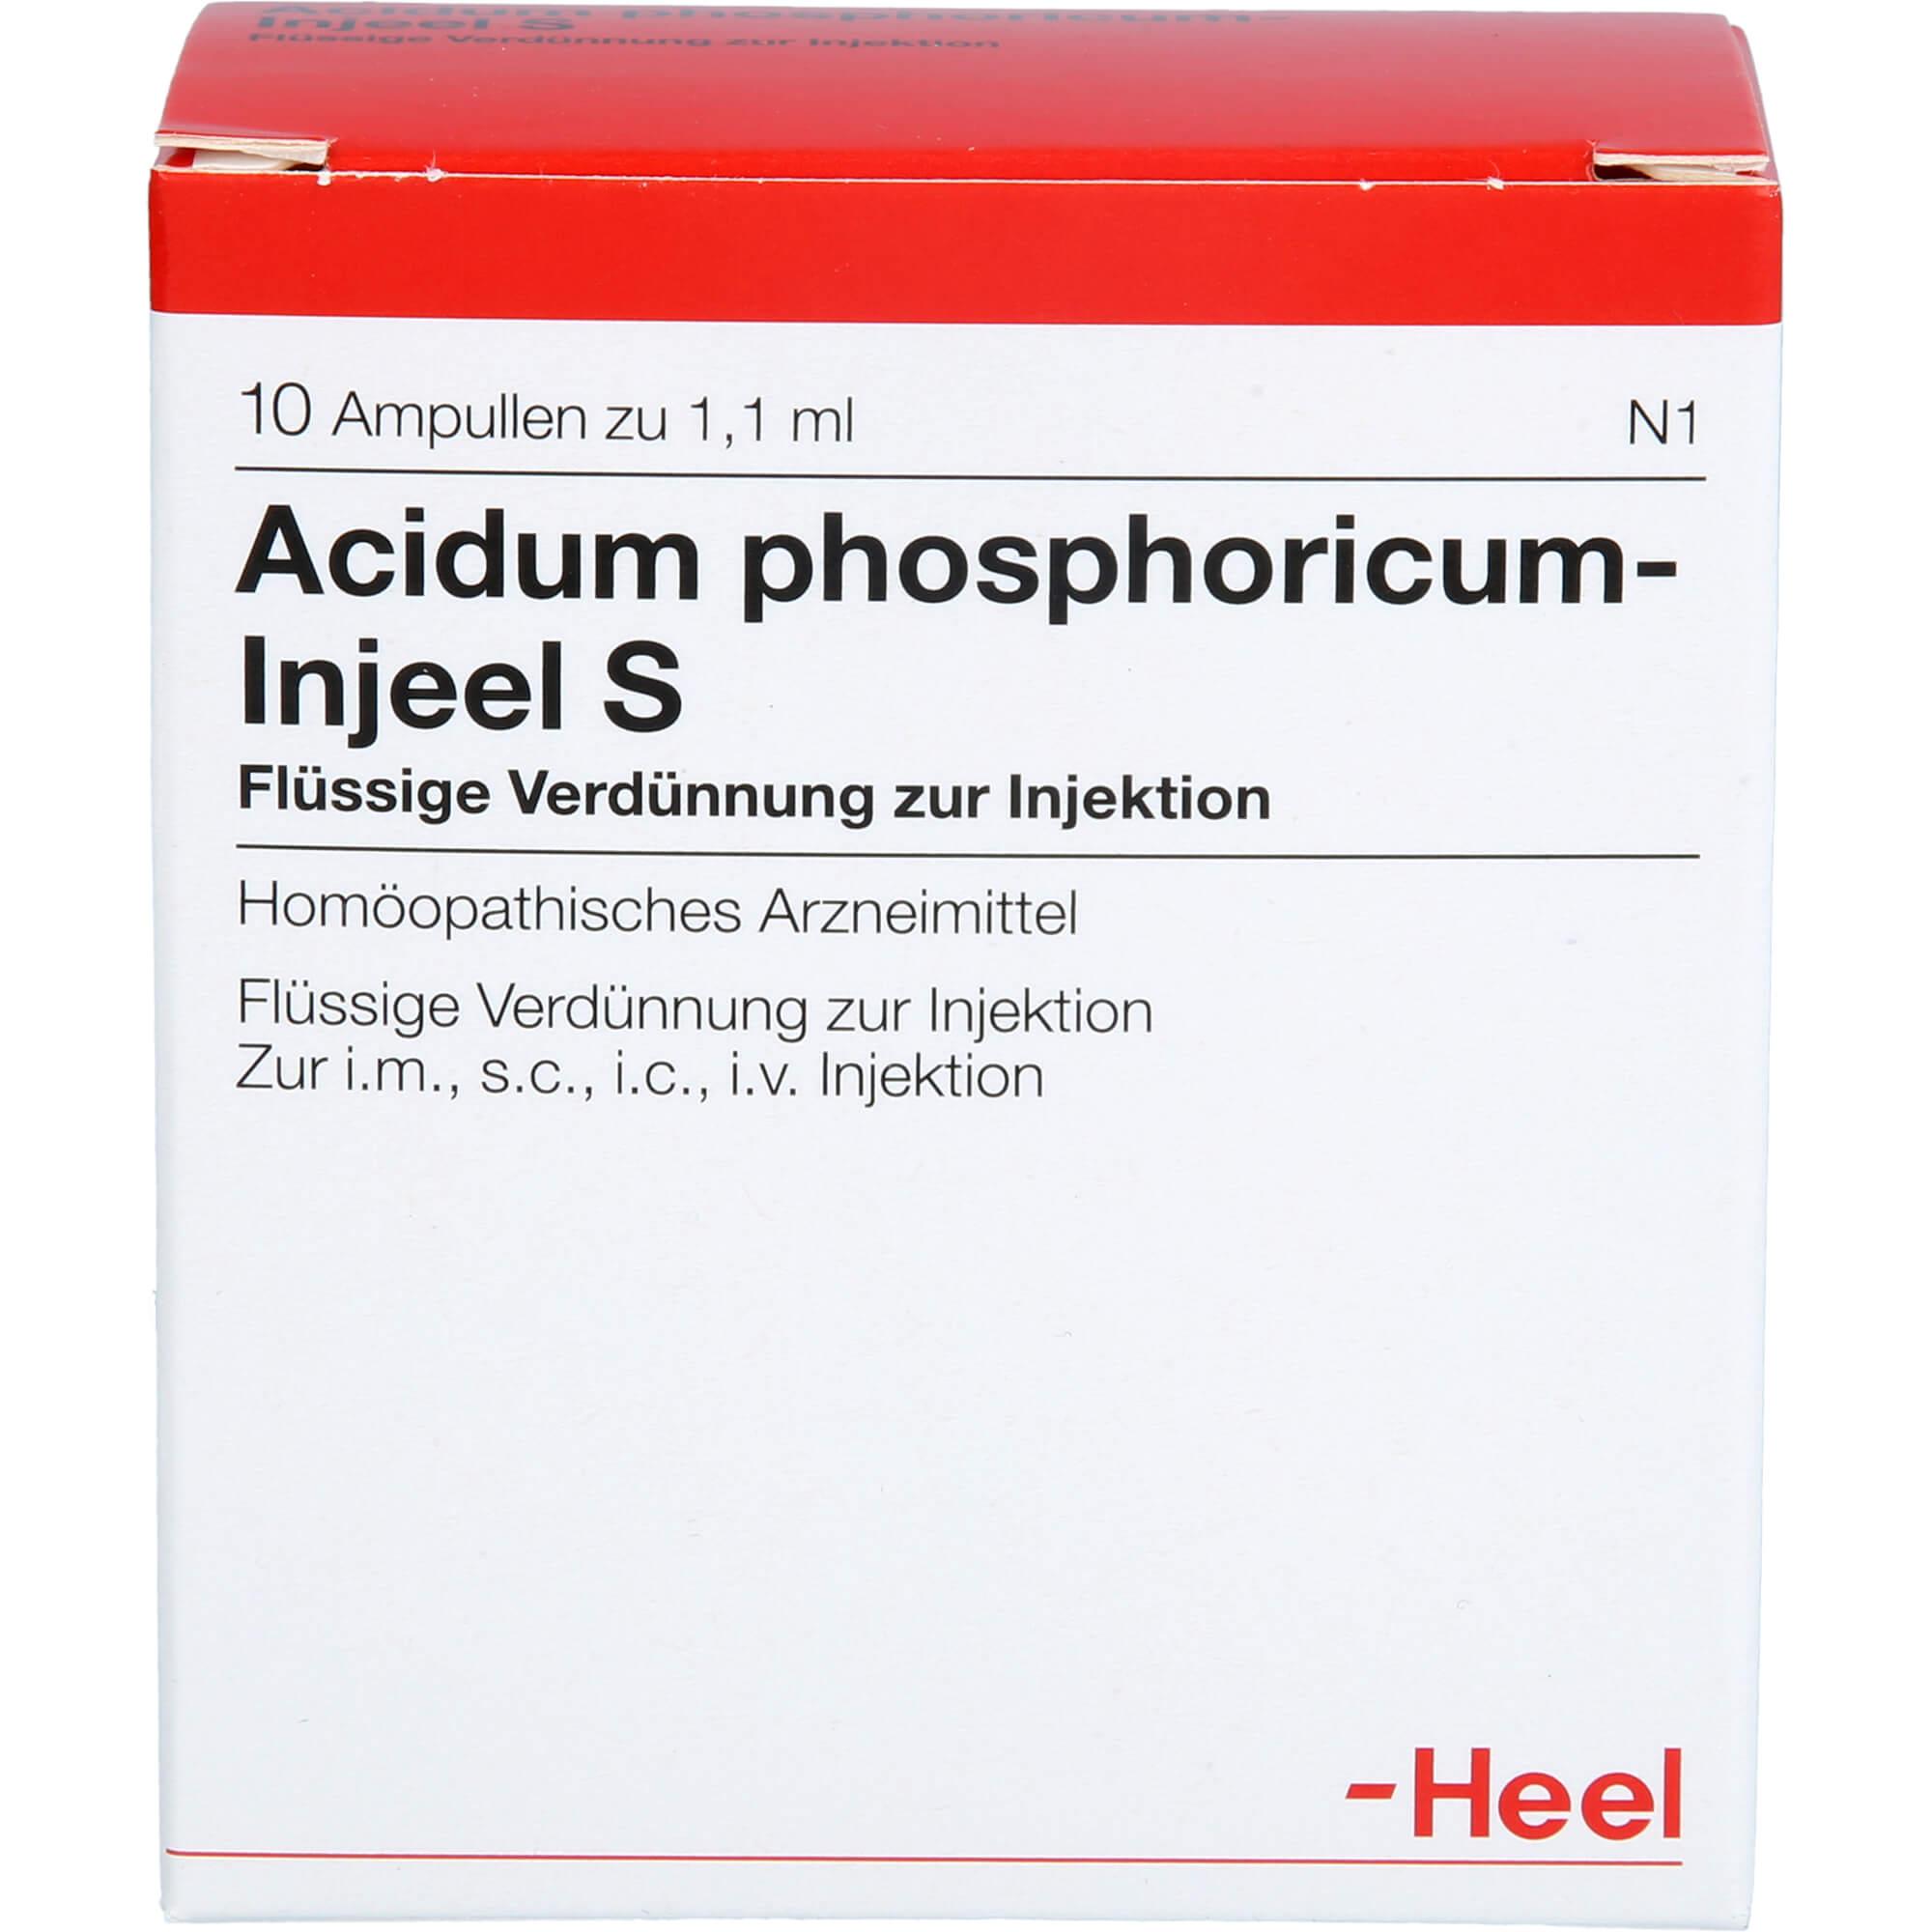 ACIDUM PHOSPHORICUM INJEEL S Ampullen